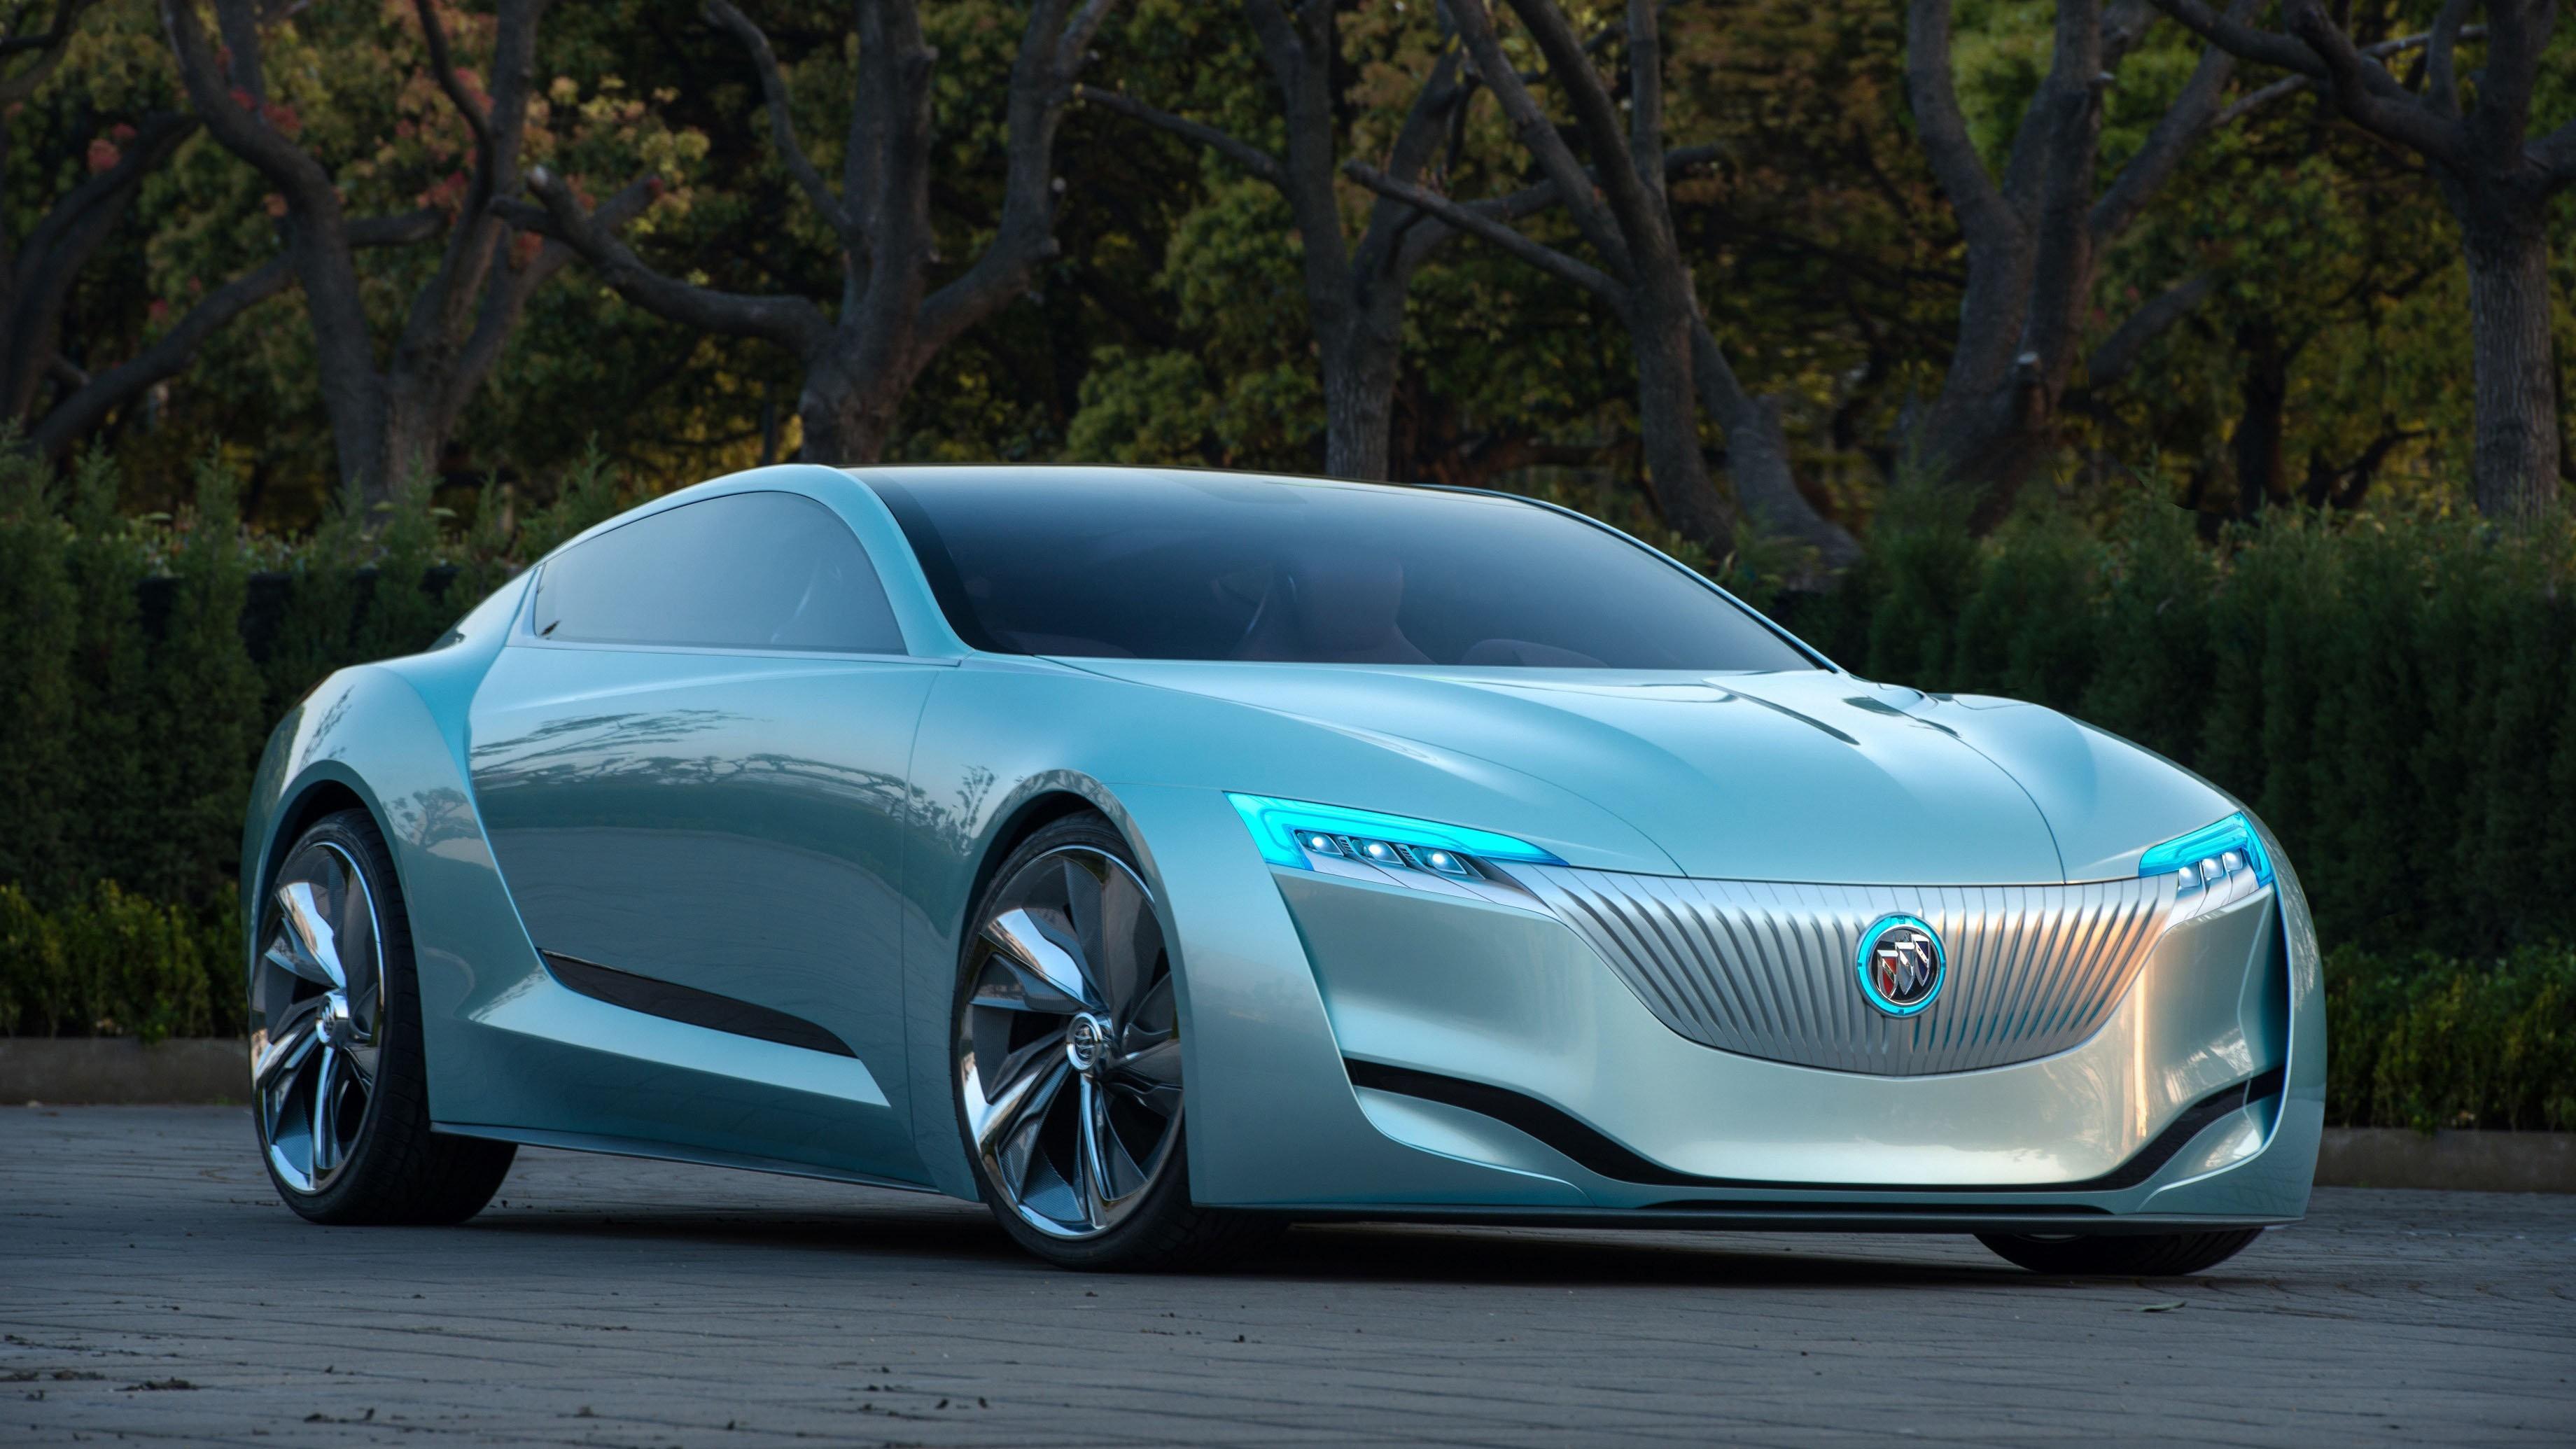 2016 Camaro Concept >> Wallpaper Buick Riviera, hybrid, electric, sedan, 2016, review, Cars & Bikes #6616